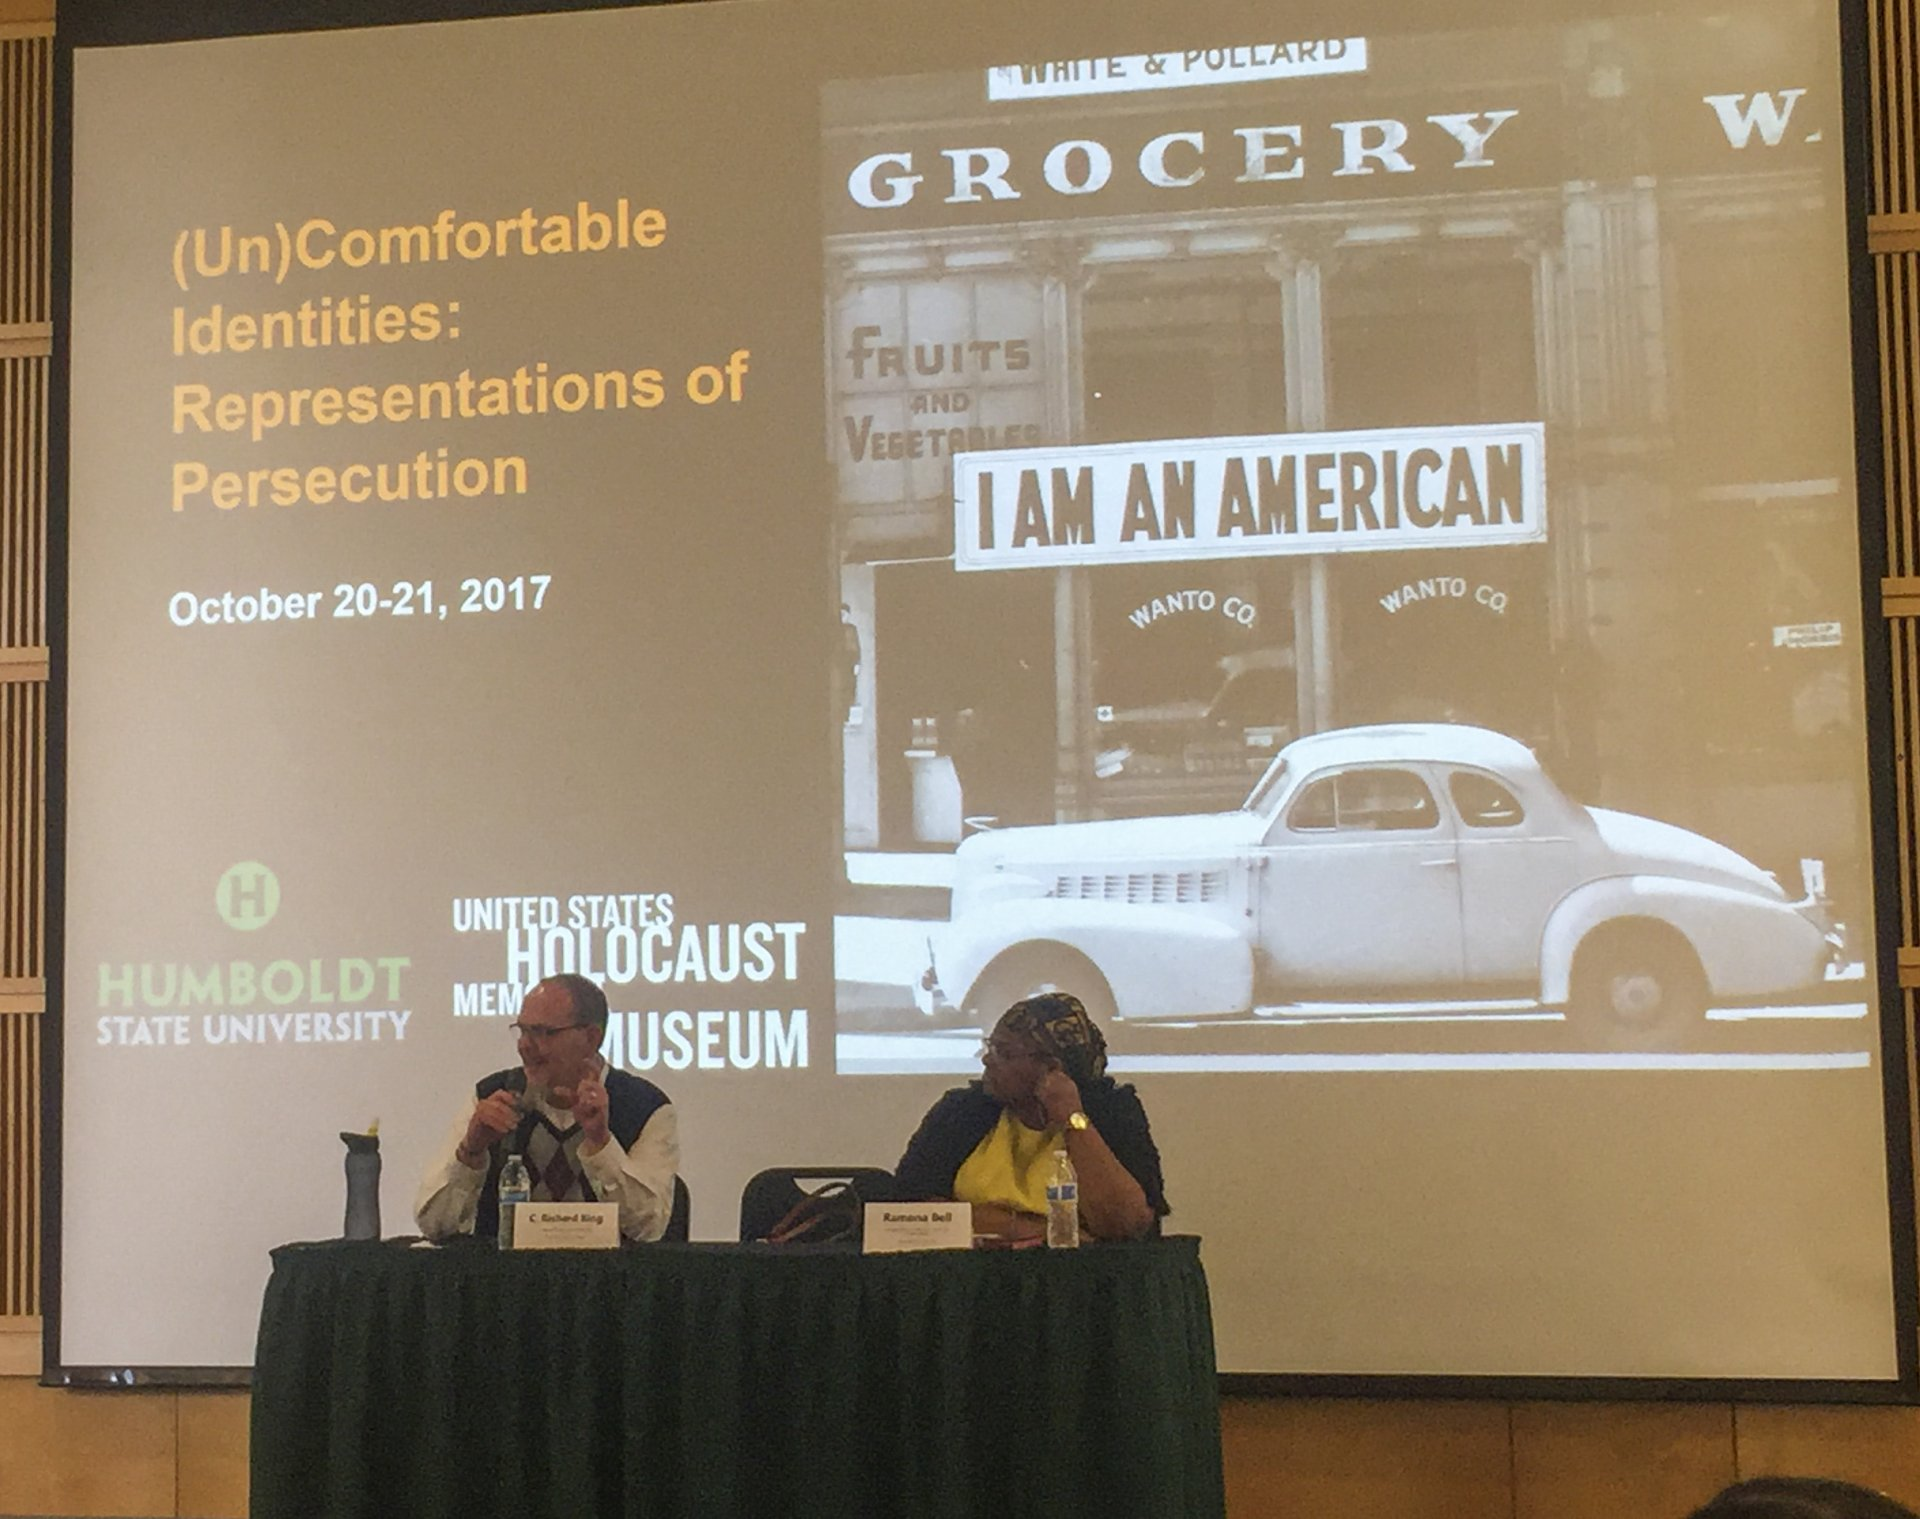 C. Richard King of Washington State University (left) and Romana Bell (right) of HSU discuss historical white supremacy. Photo credit: Lora Neshovska